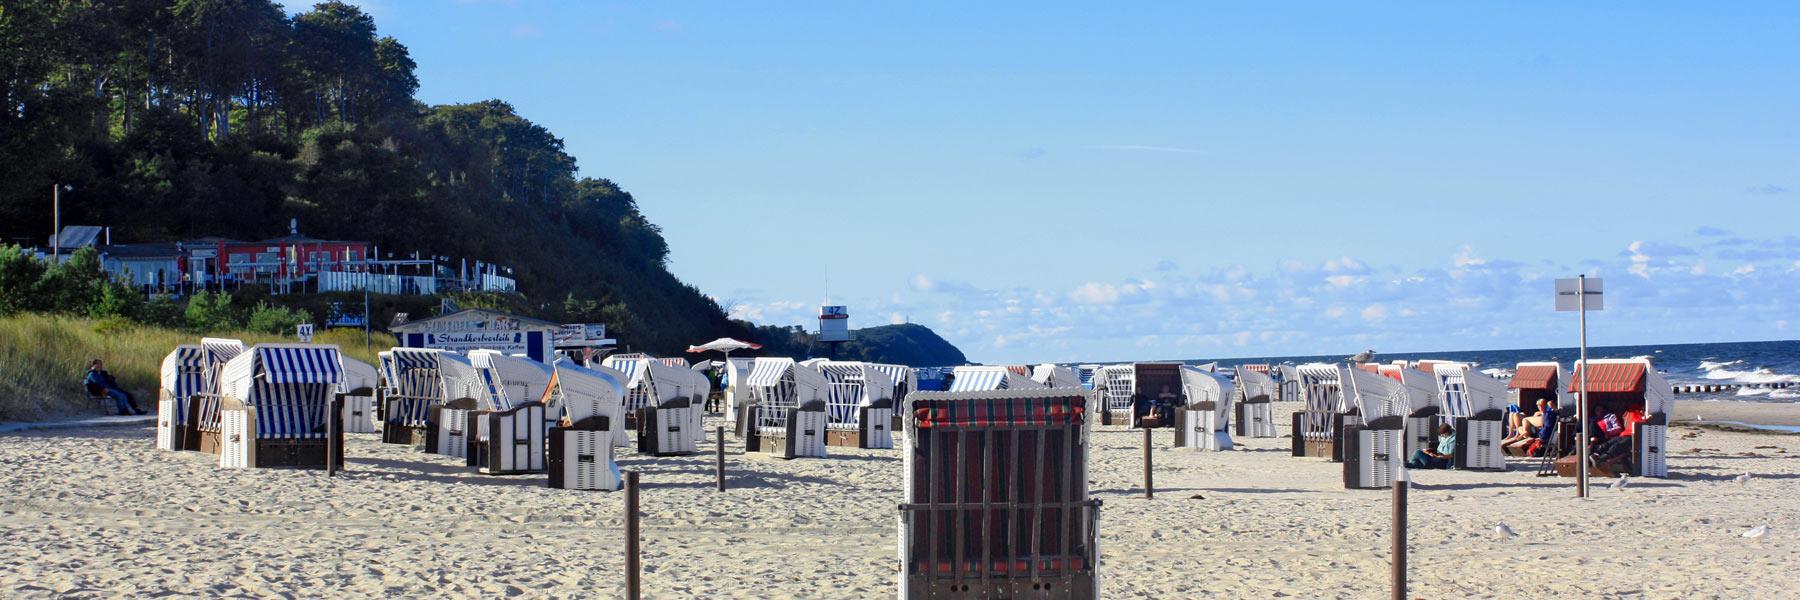 Strand - Seebad Ückeritz